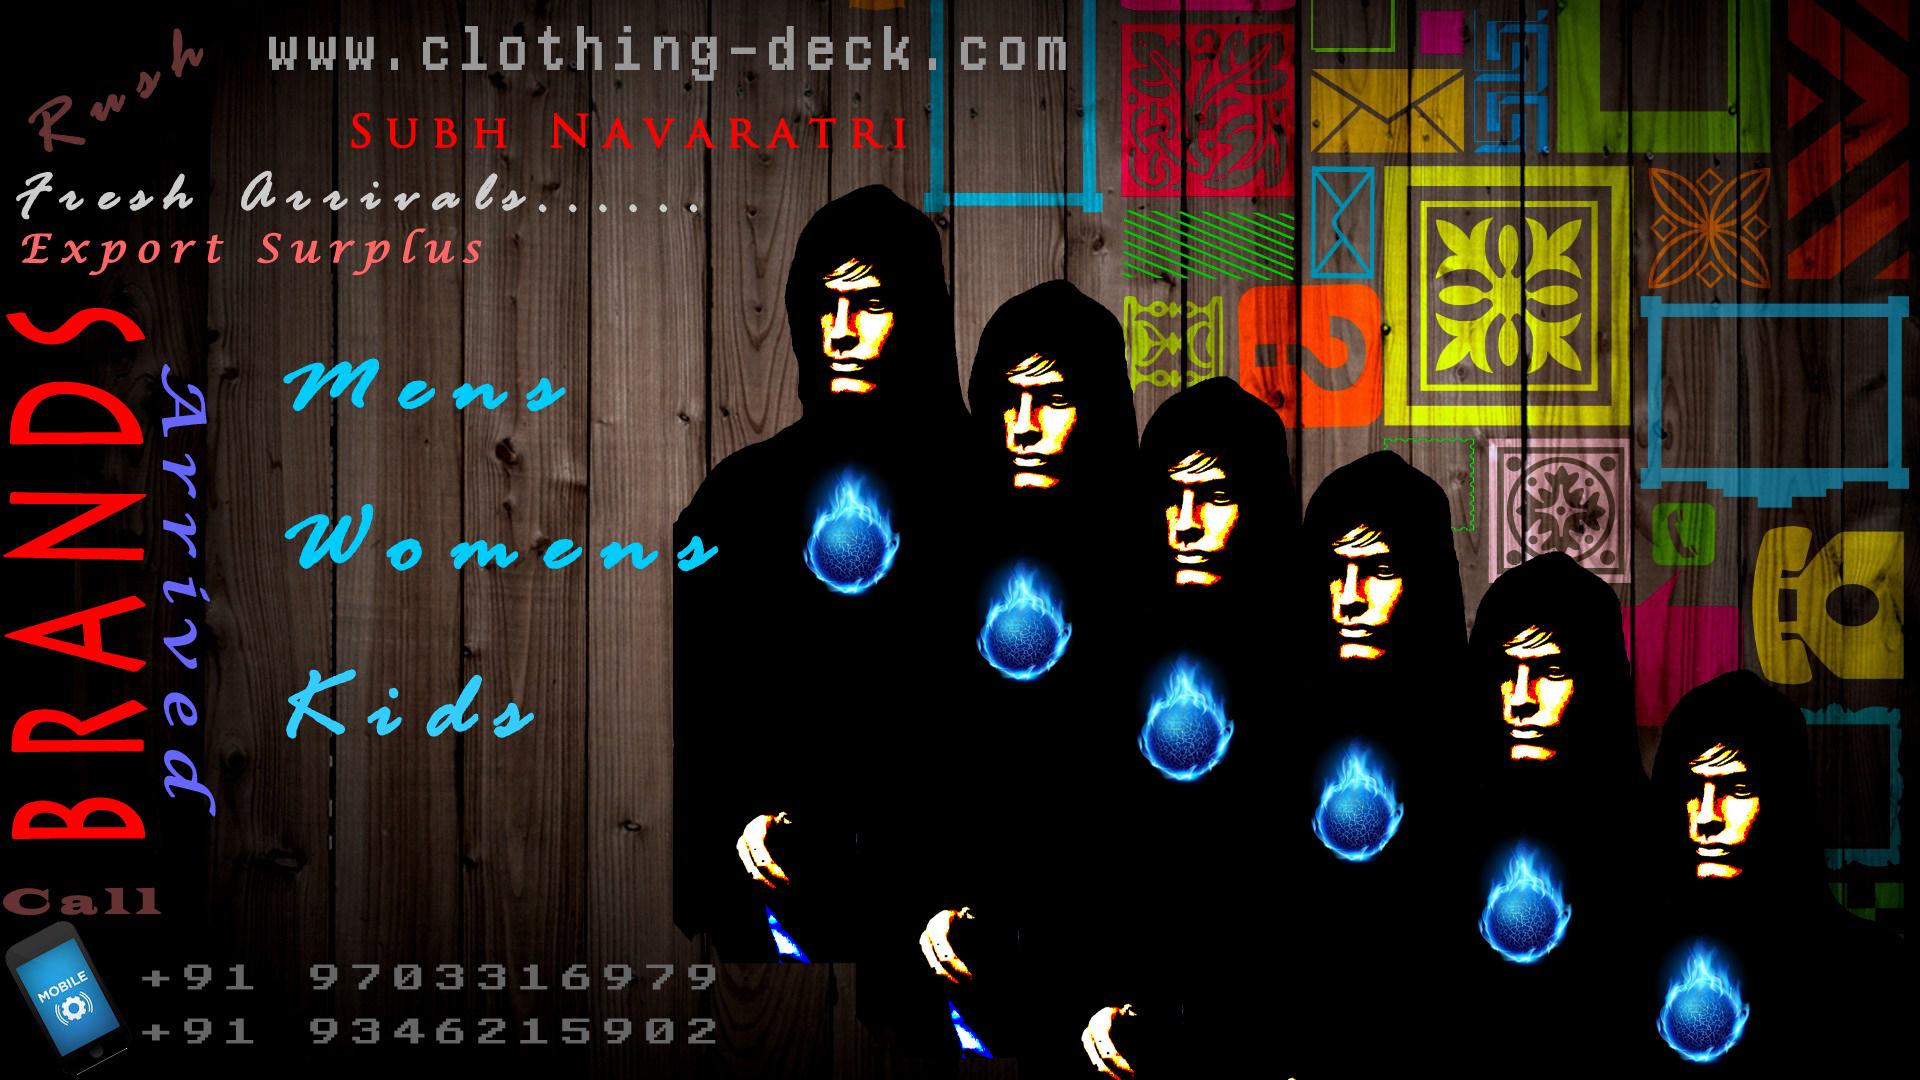 clothing Deck